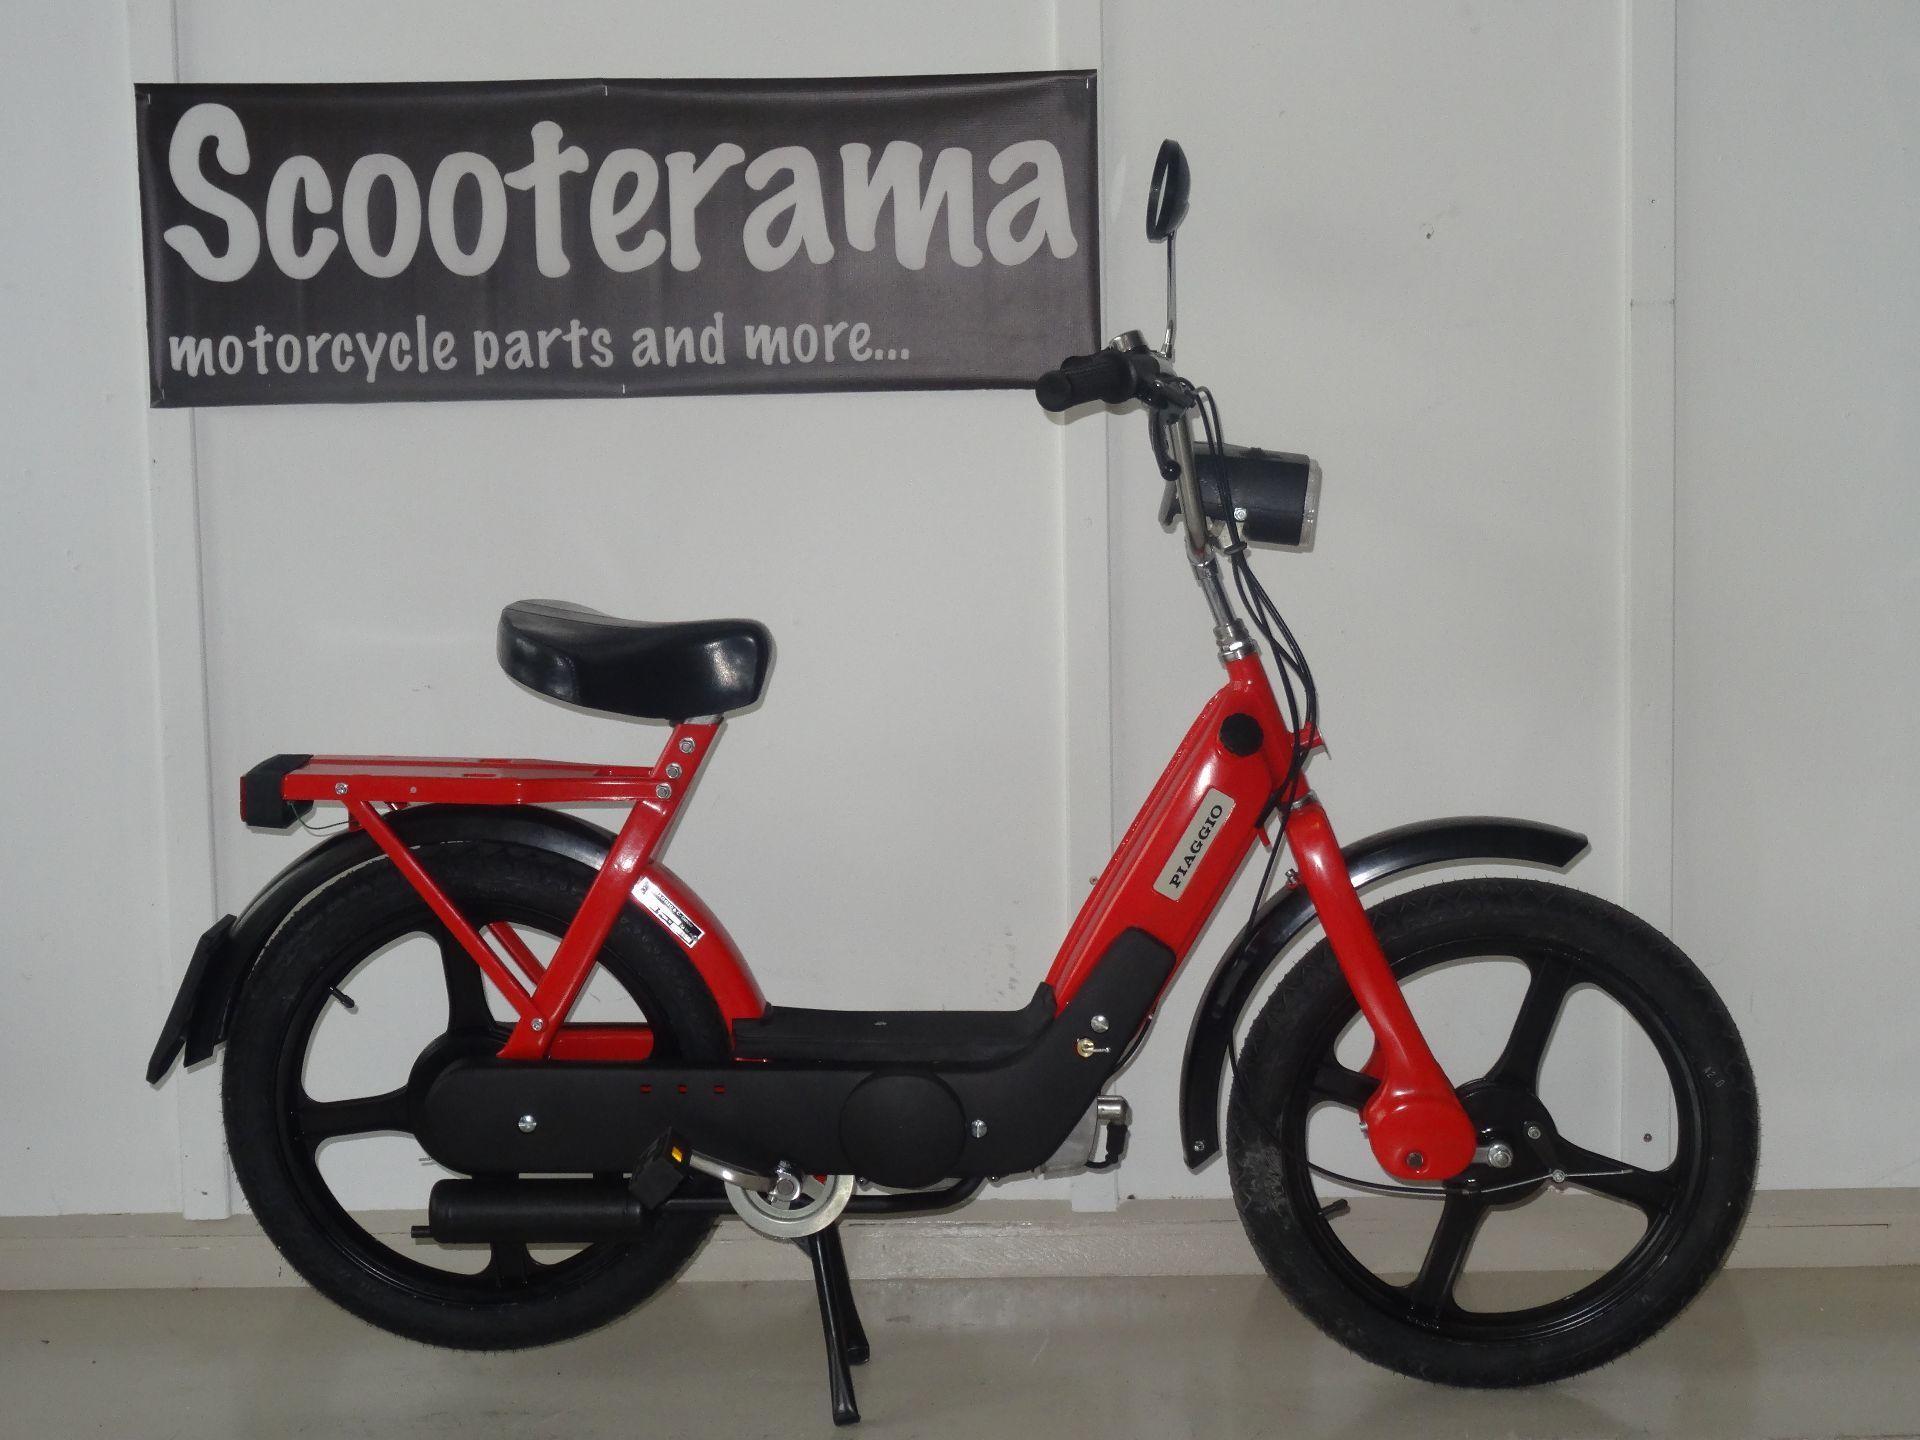 moto occasions acheter piaggio ciao scooterama gmbh herzogenbuchsee. Black Bedroom Furniture Sets. Home Design Ideas